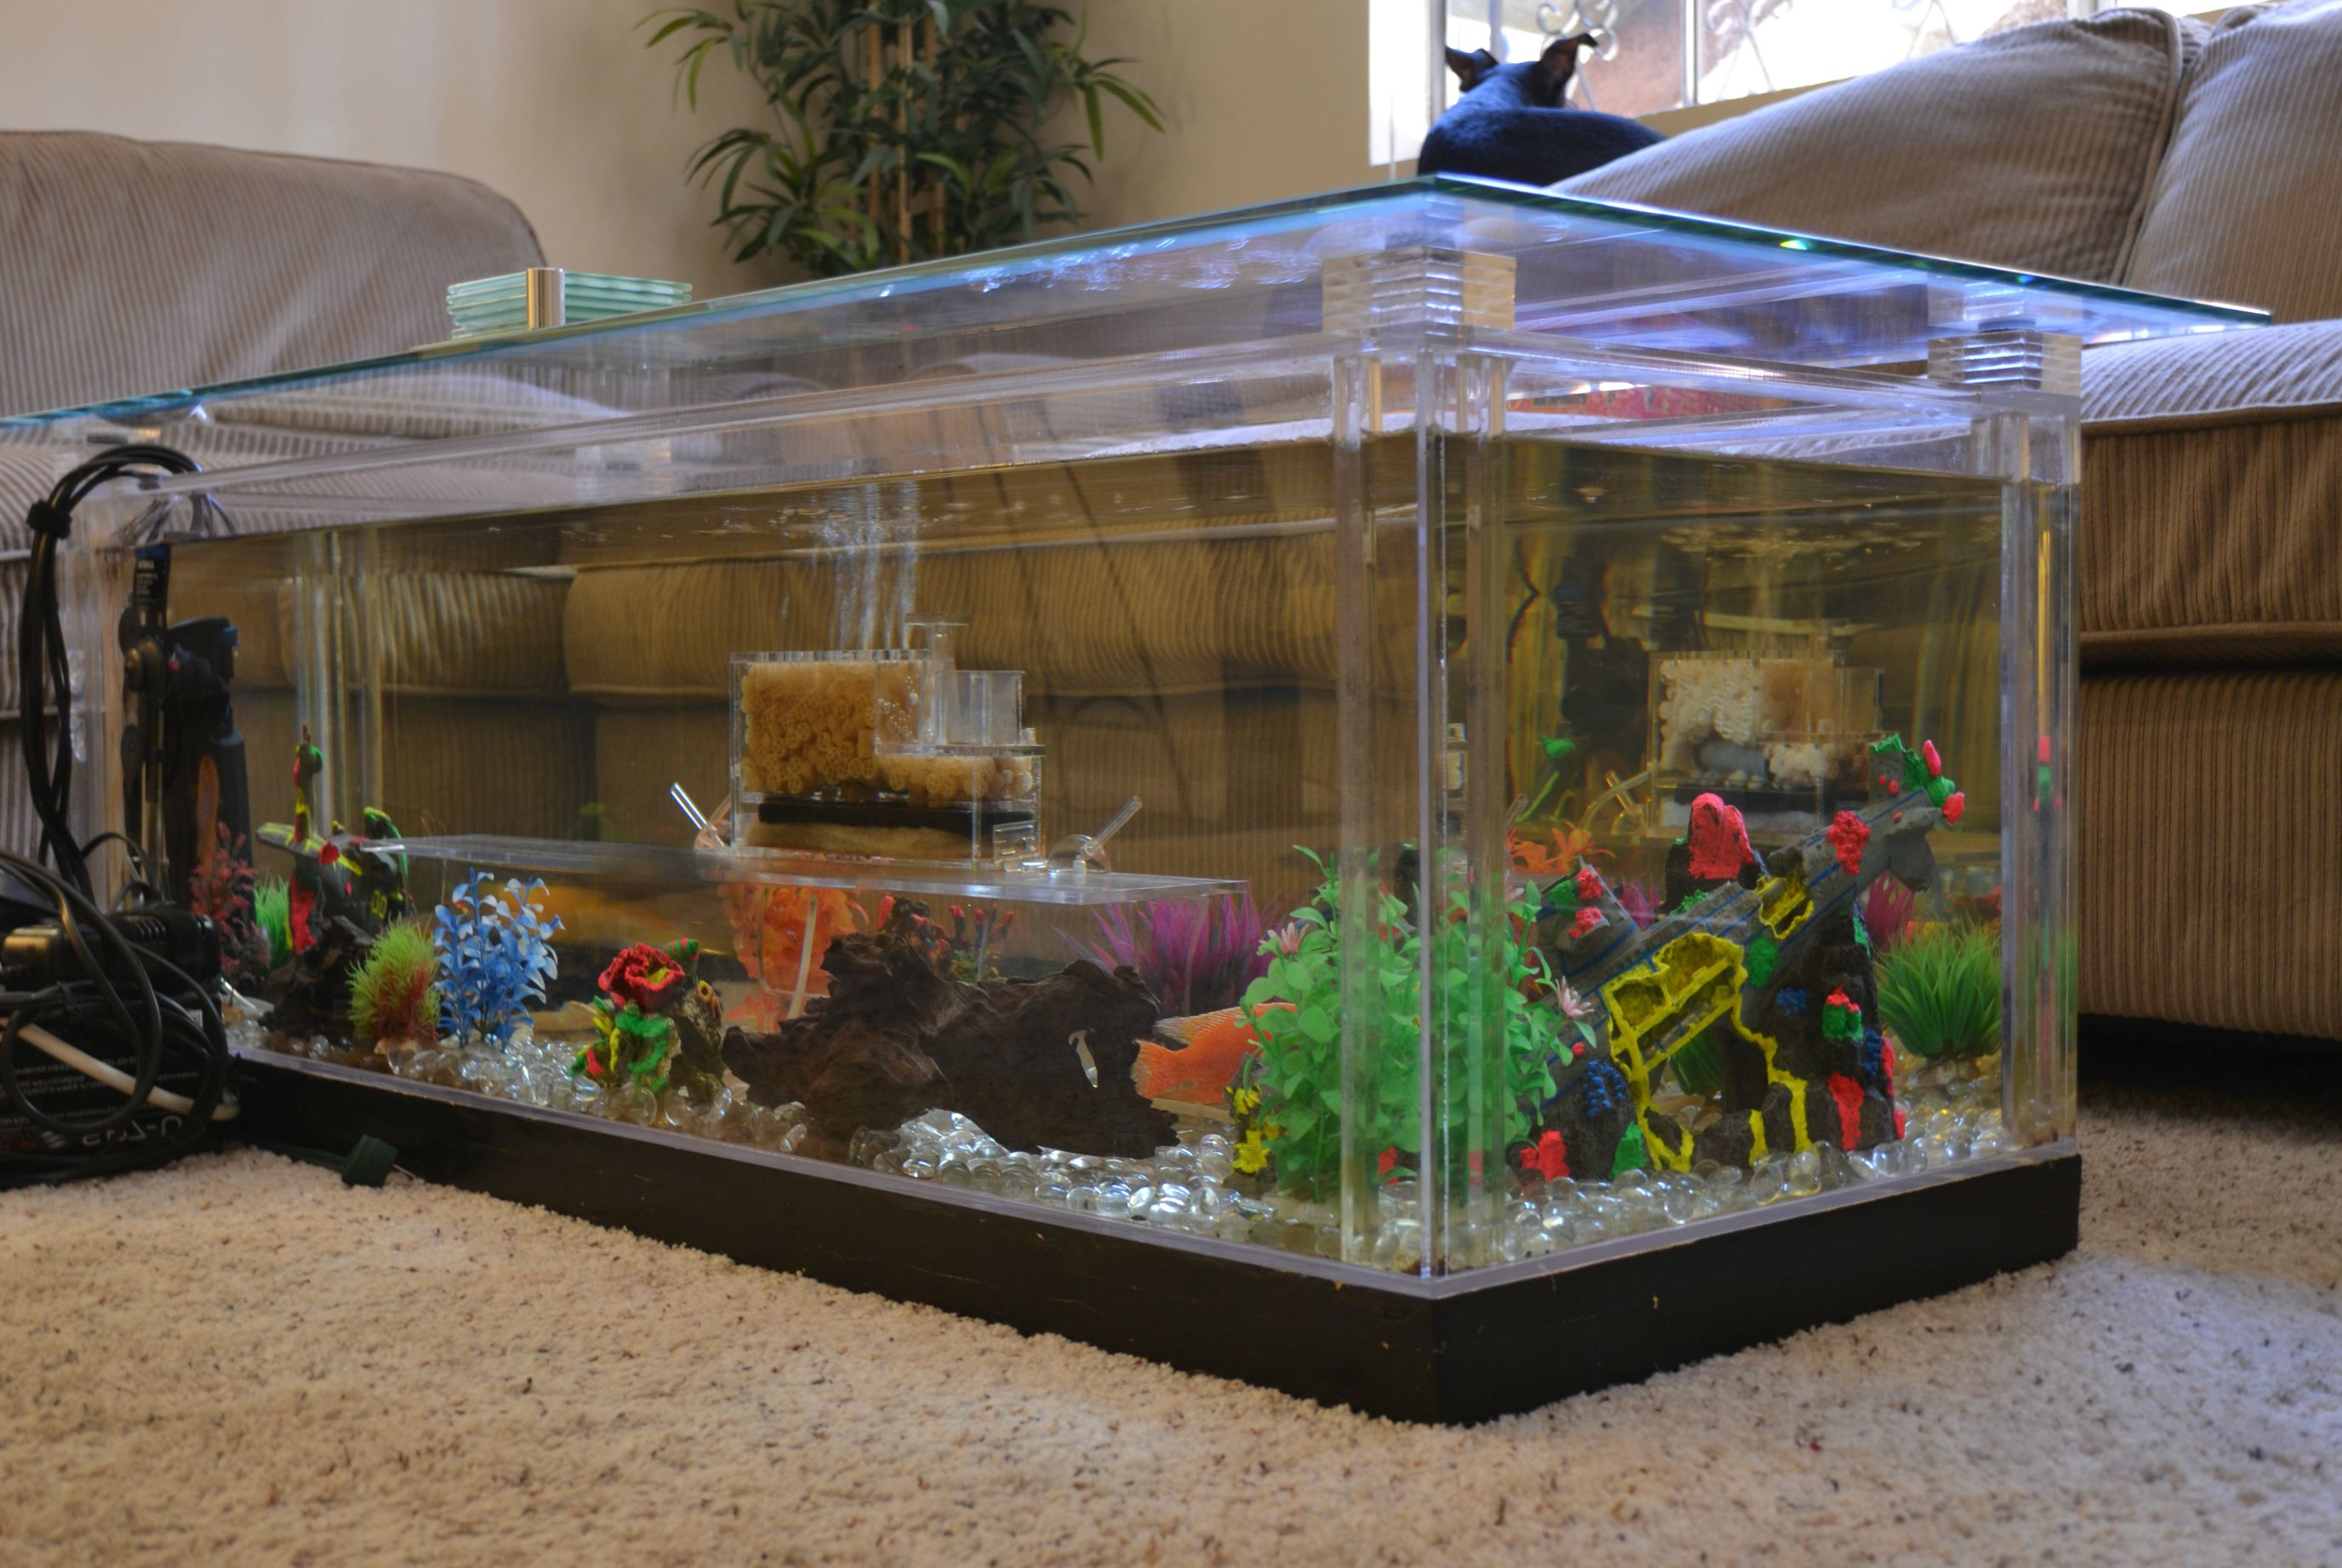 Coffee Table Aquarium For Sale